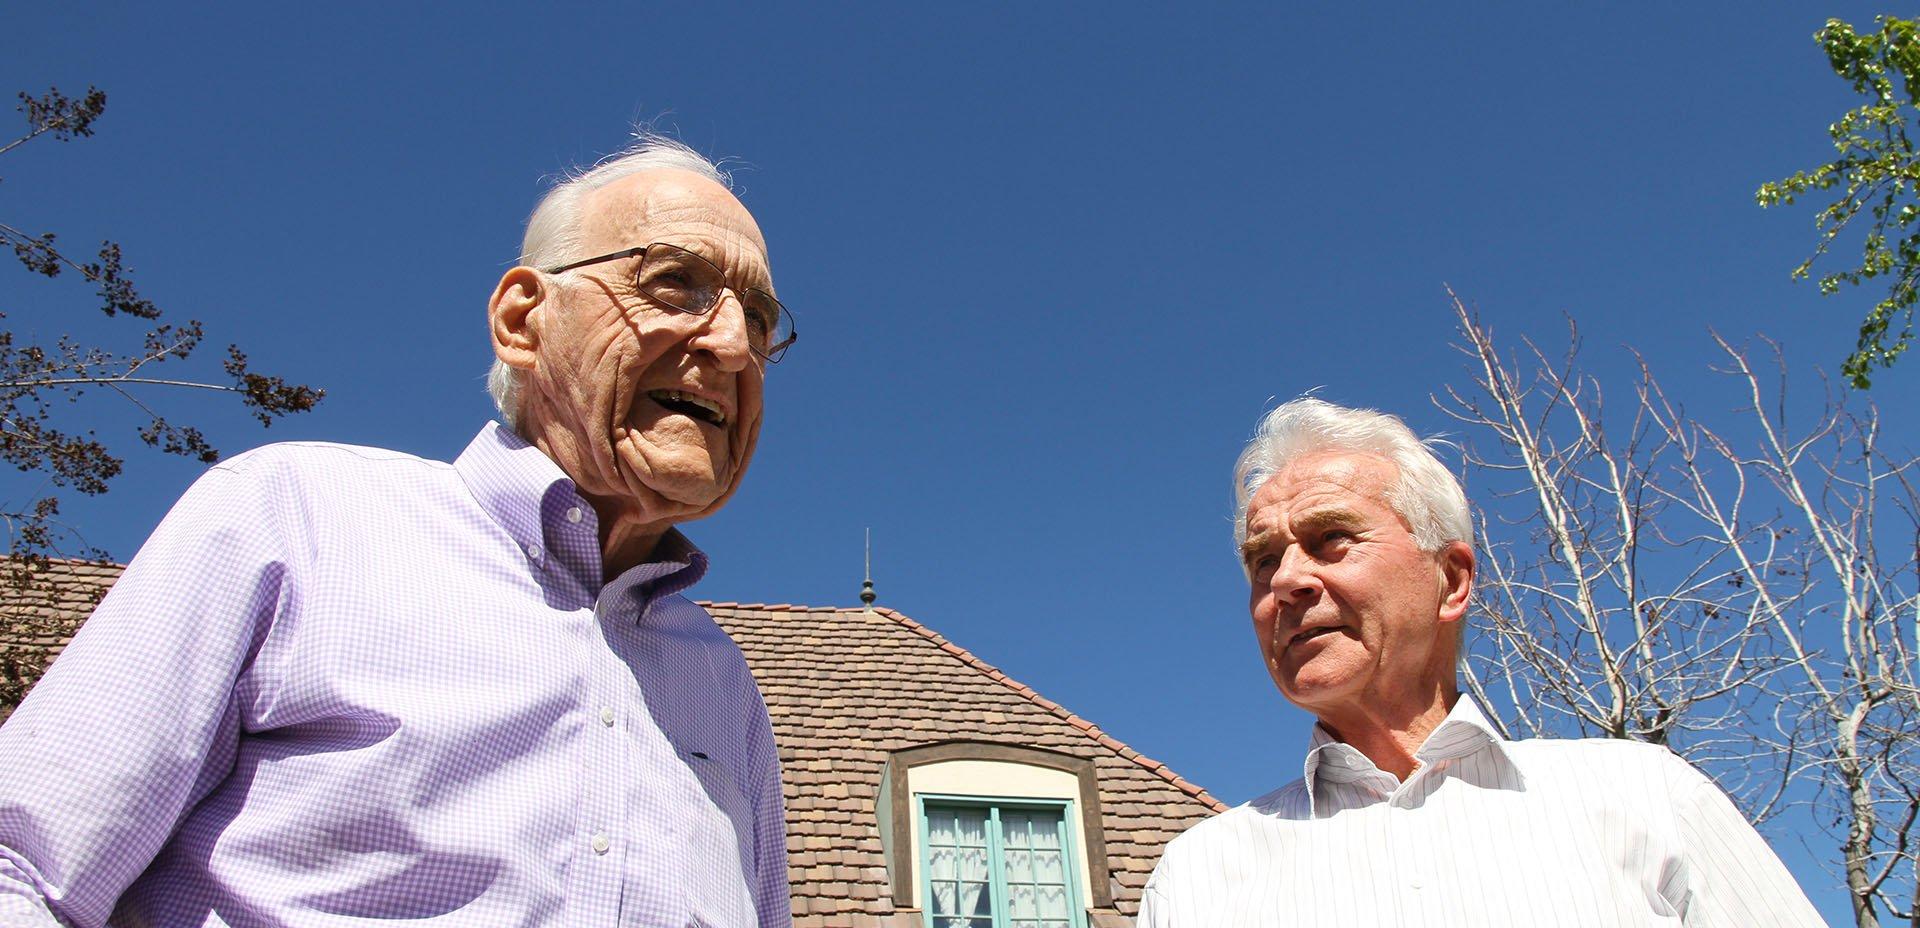 Ellsworth Wareham e Claus Leitzmann